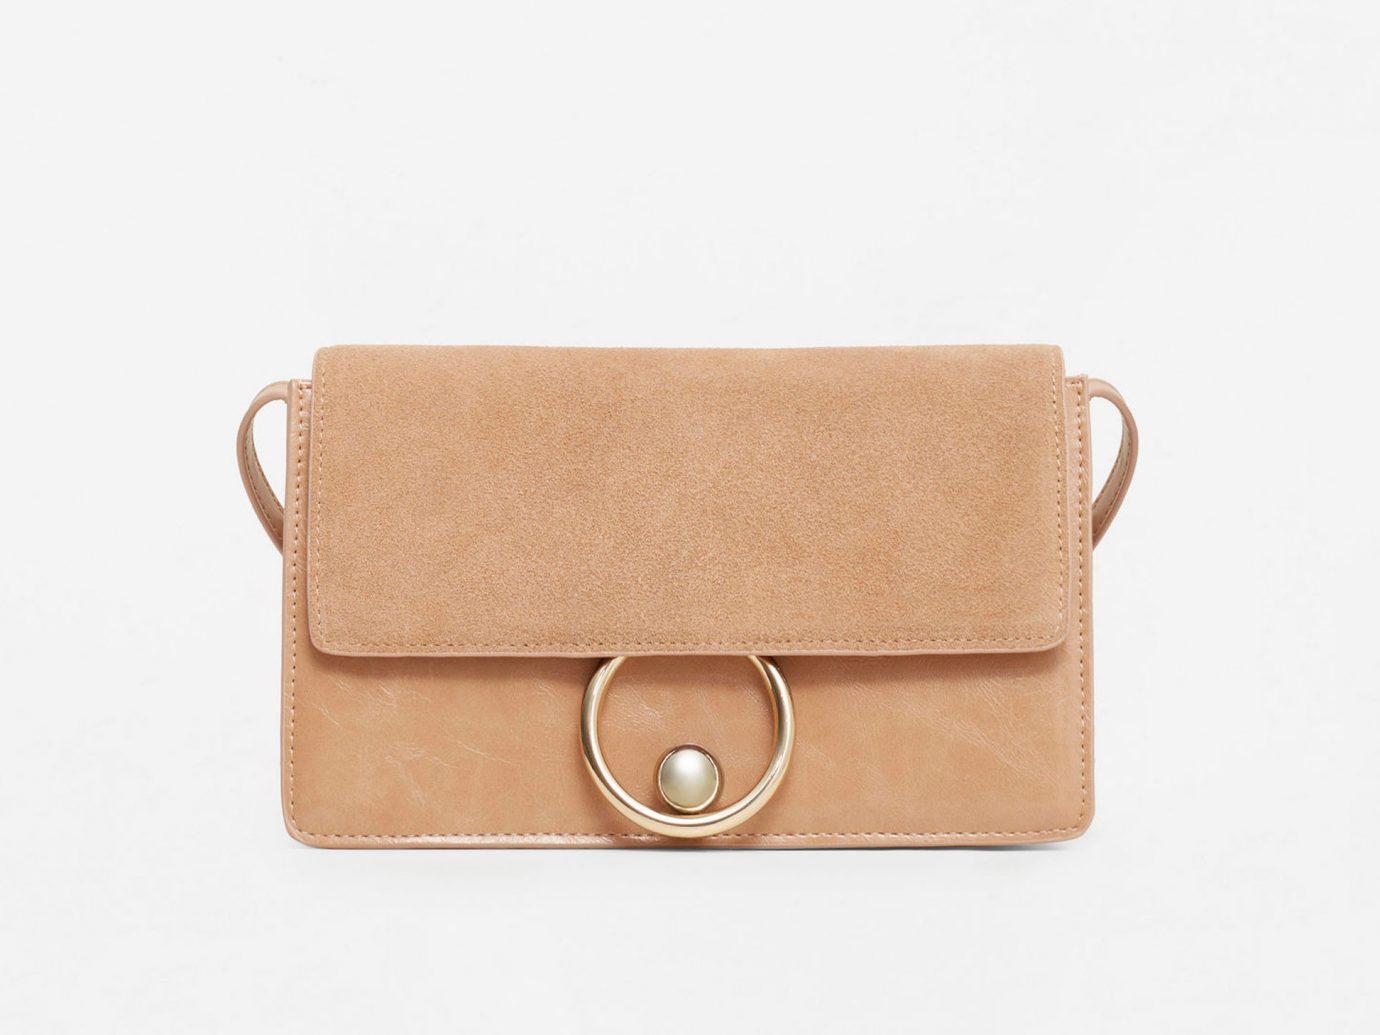 Style + Design accessory case bag brown handbag leather fashion accessory shoulder bag beige brand coin purse textile wallet